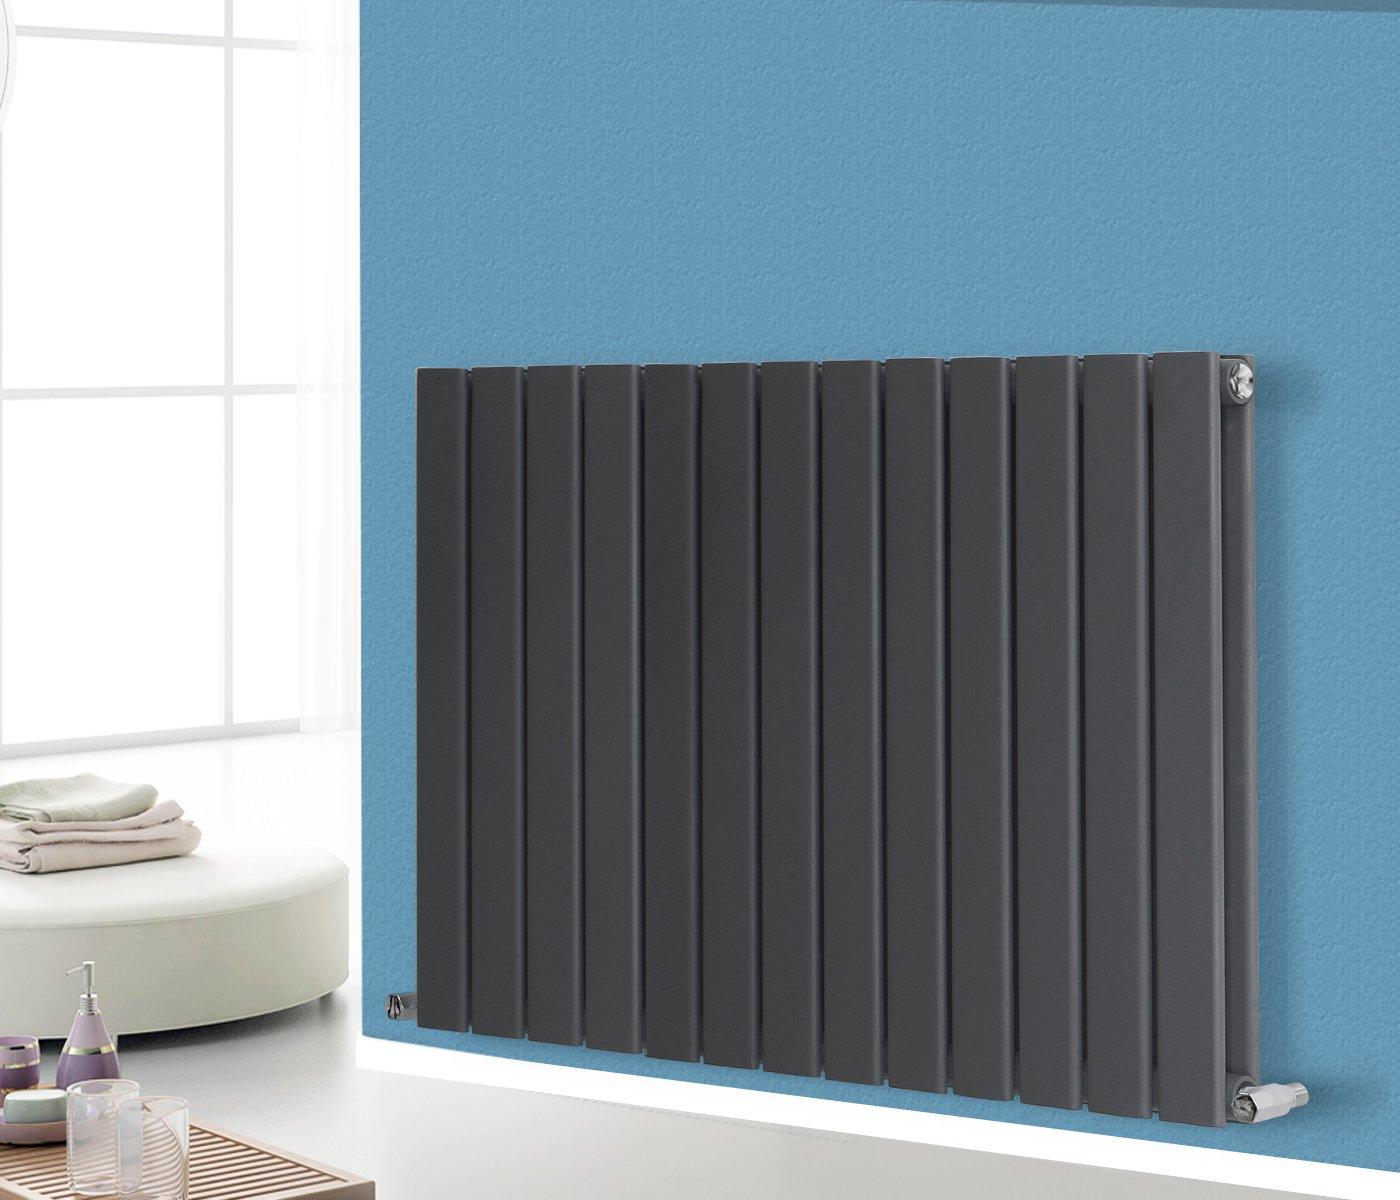 NRG 600x884 Horizontal Flat Panel Designer Radiator Modern Bathroom ...